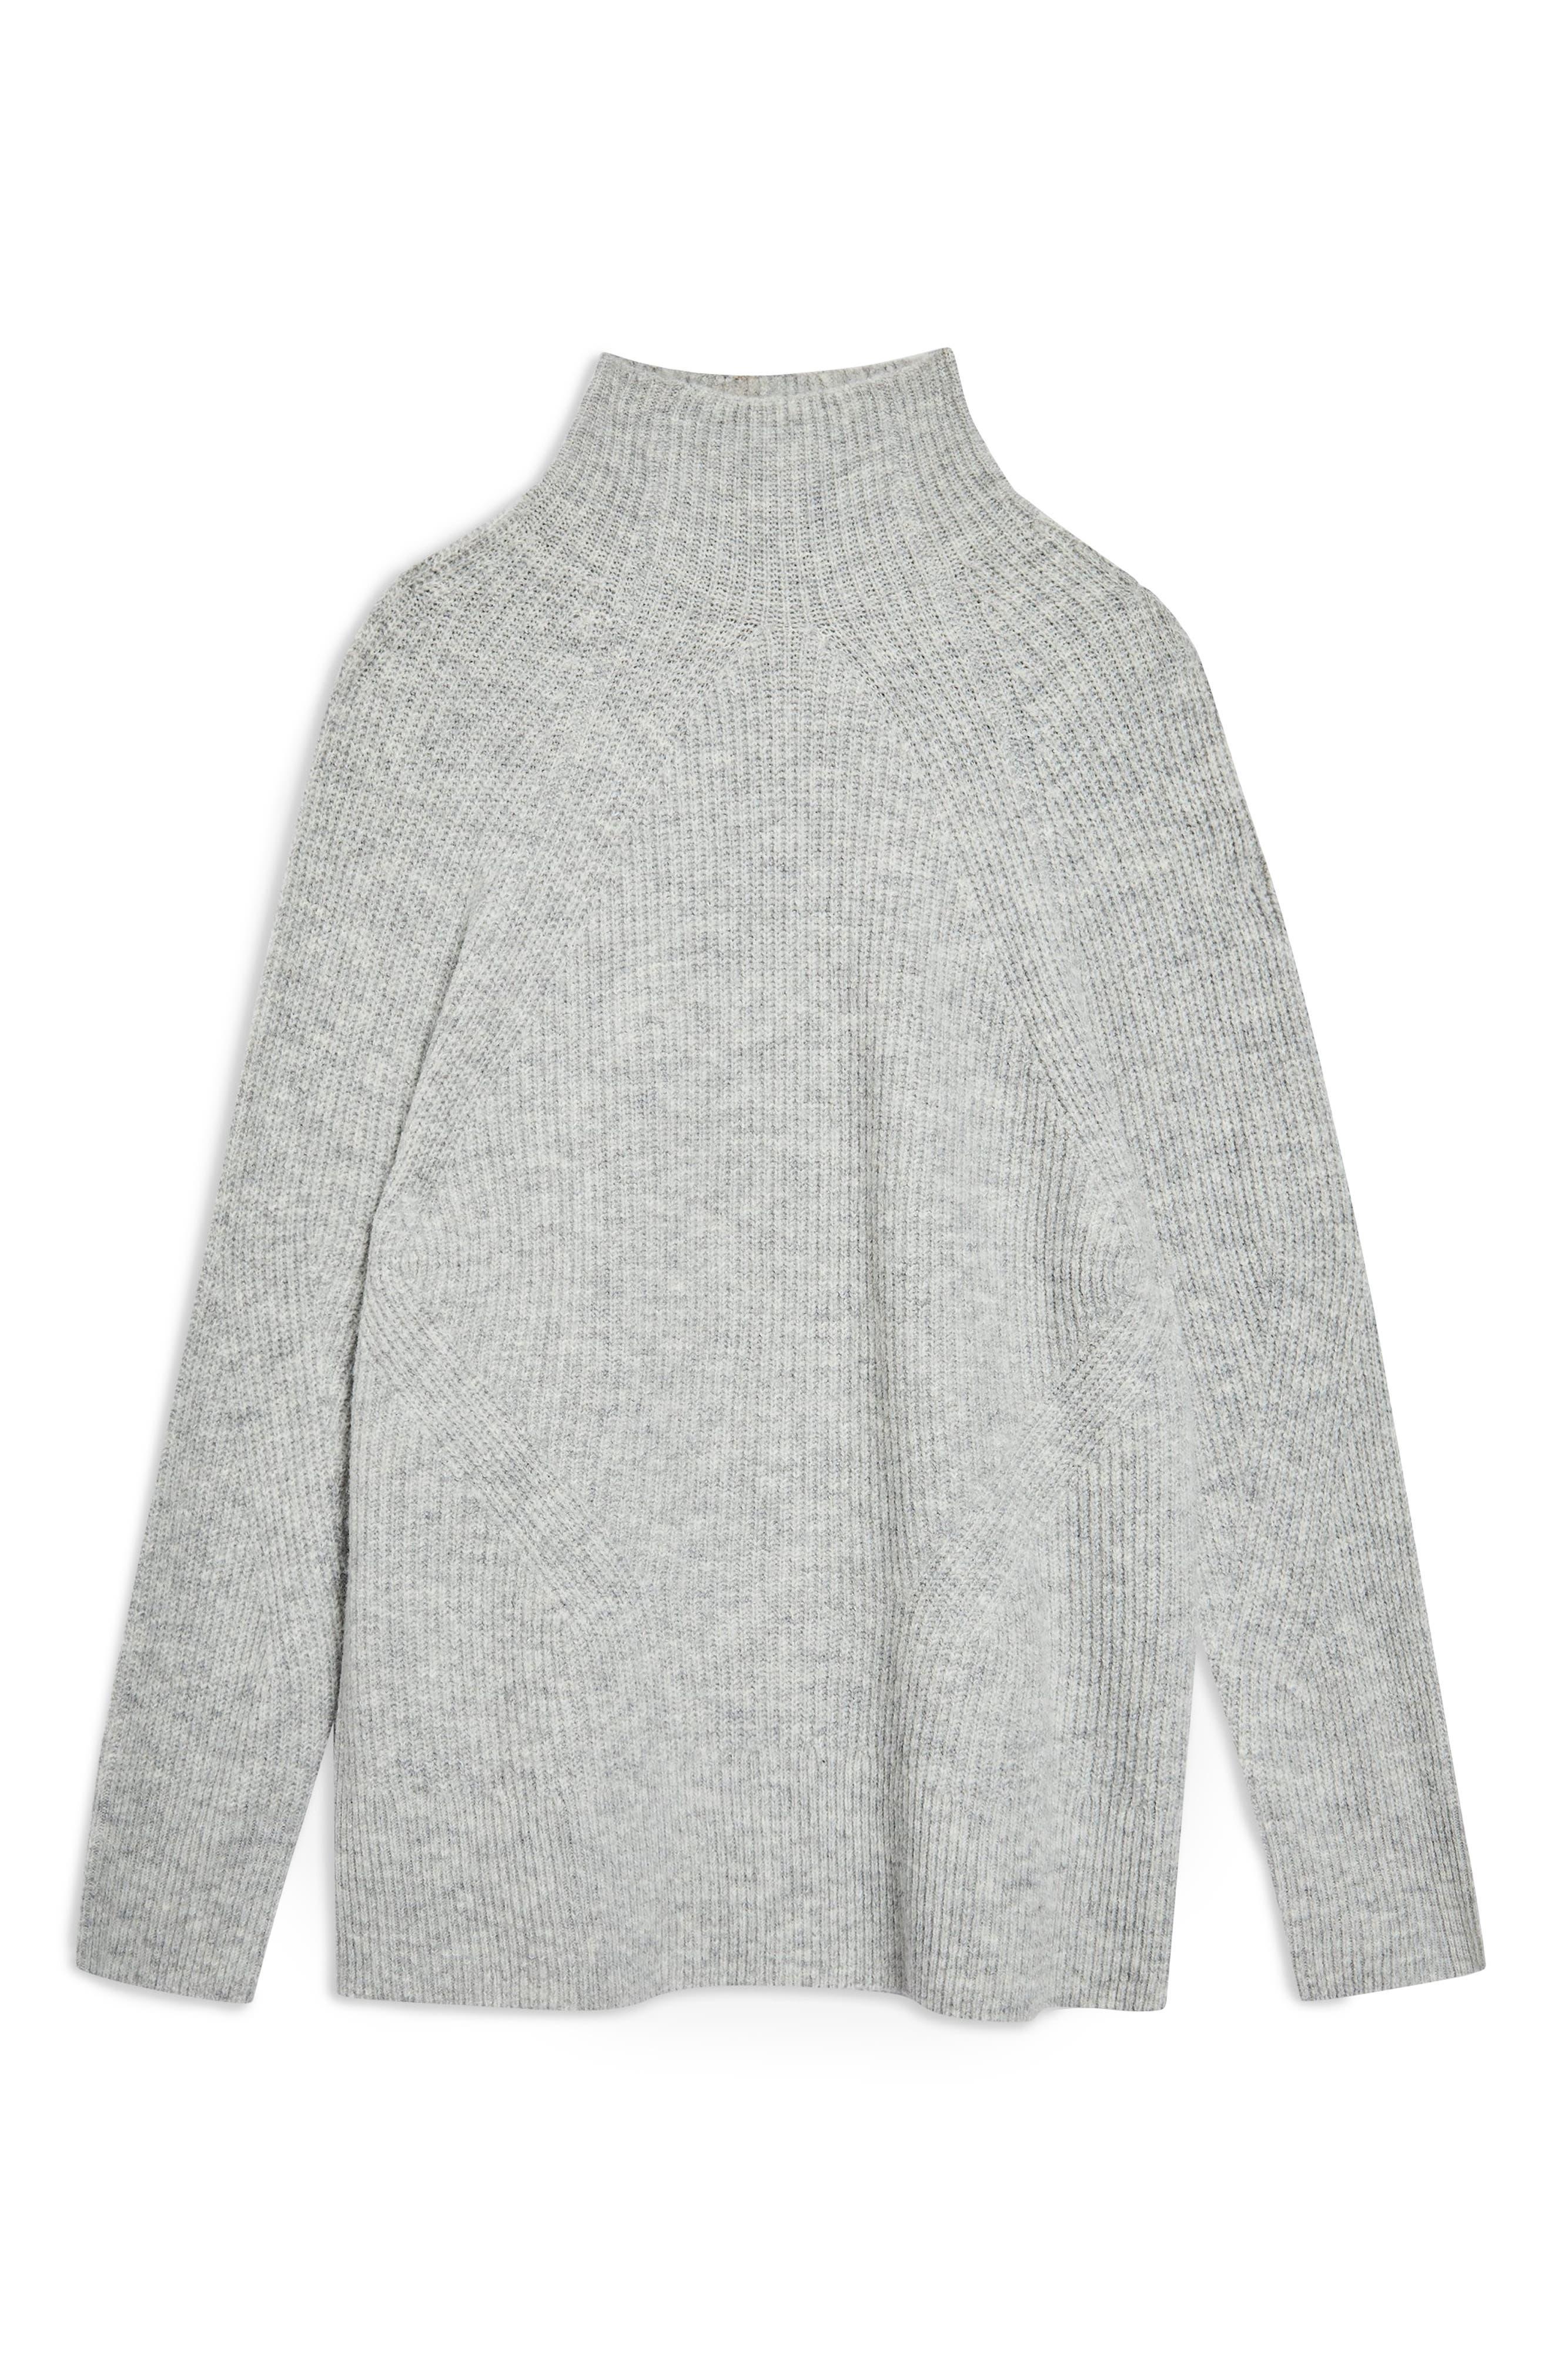 TOPSHOP, Raglan Turtleneck Neck Sweater, Alternate thumbnail 3, color, GREY MARL